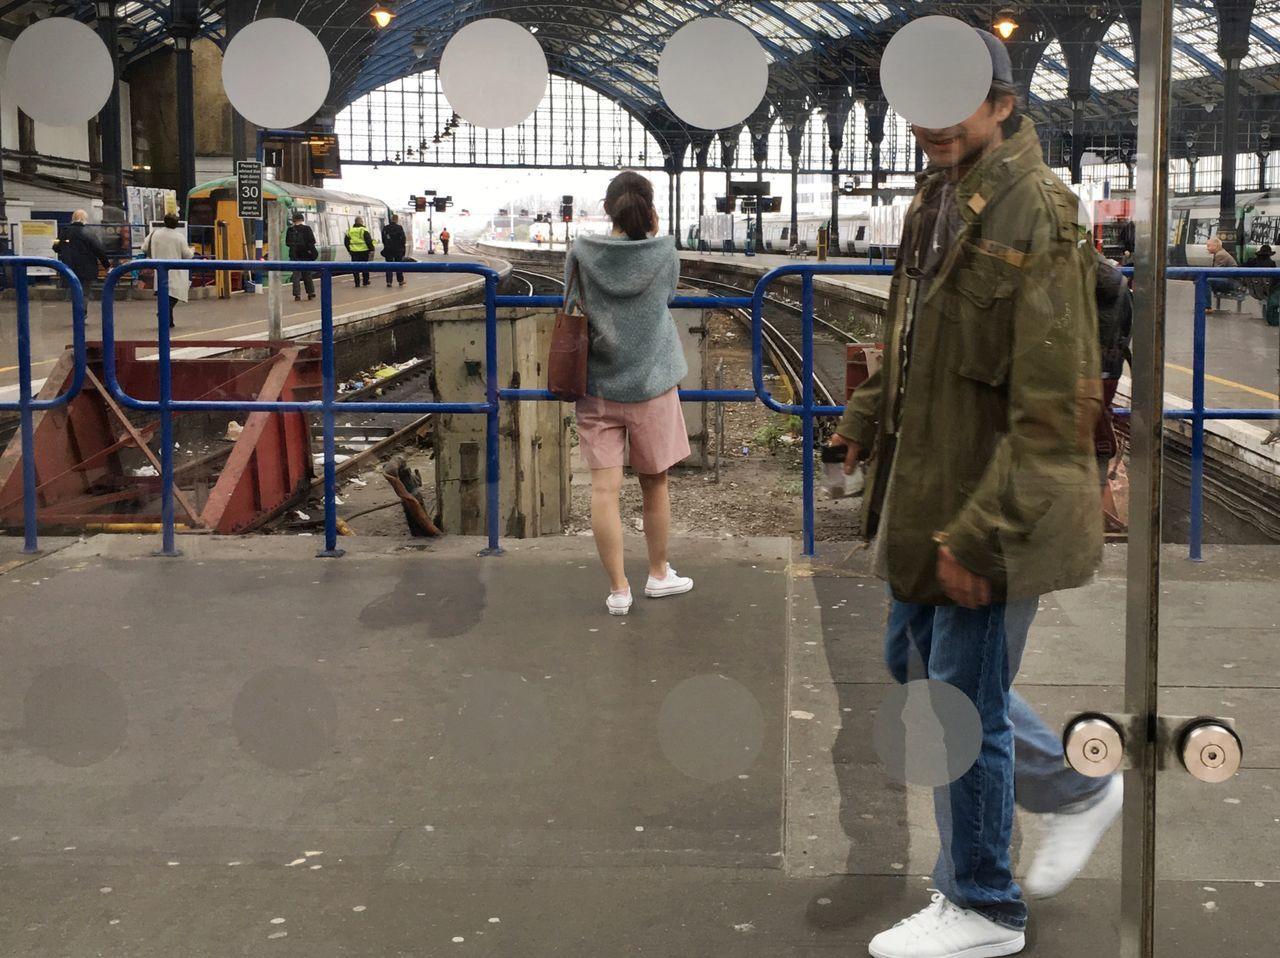 Railway Station Real People Standing Travel Two People Walking